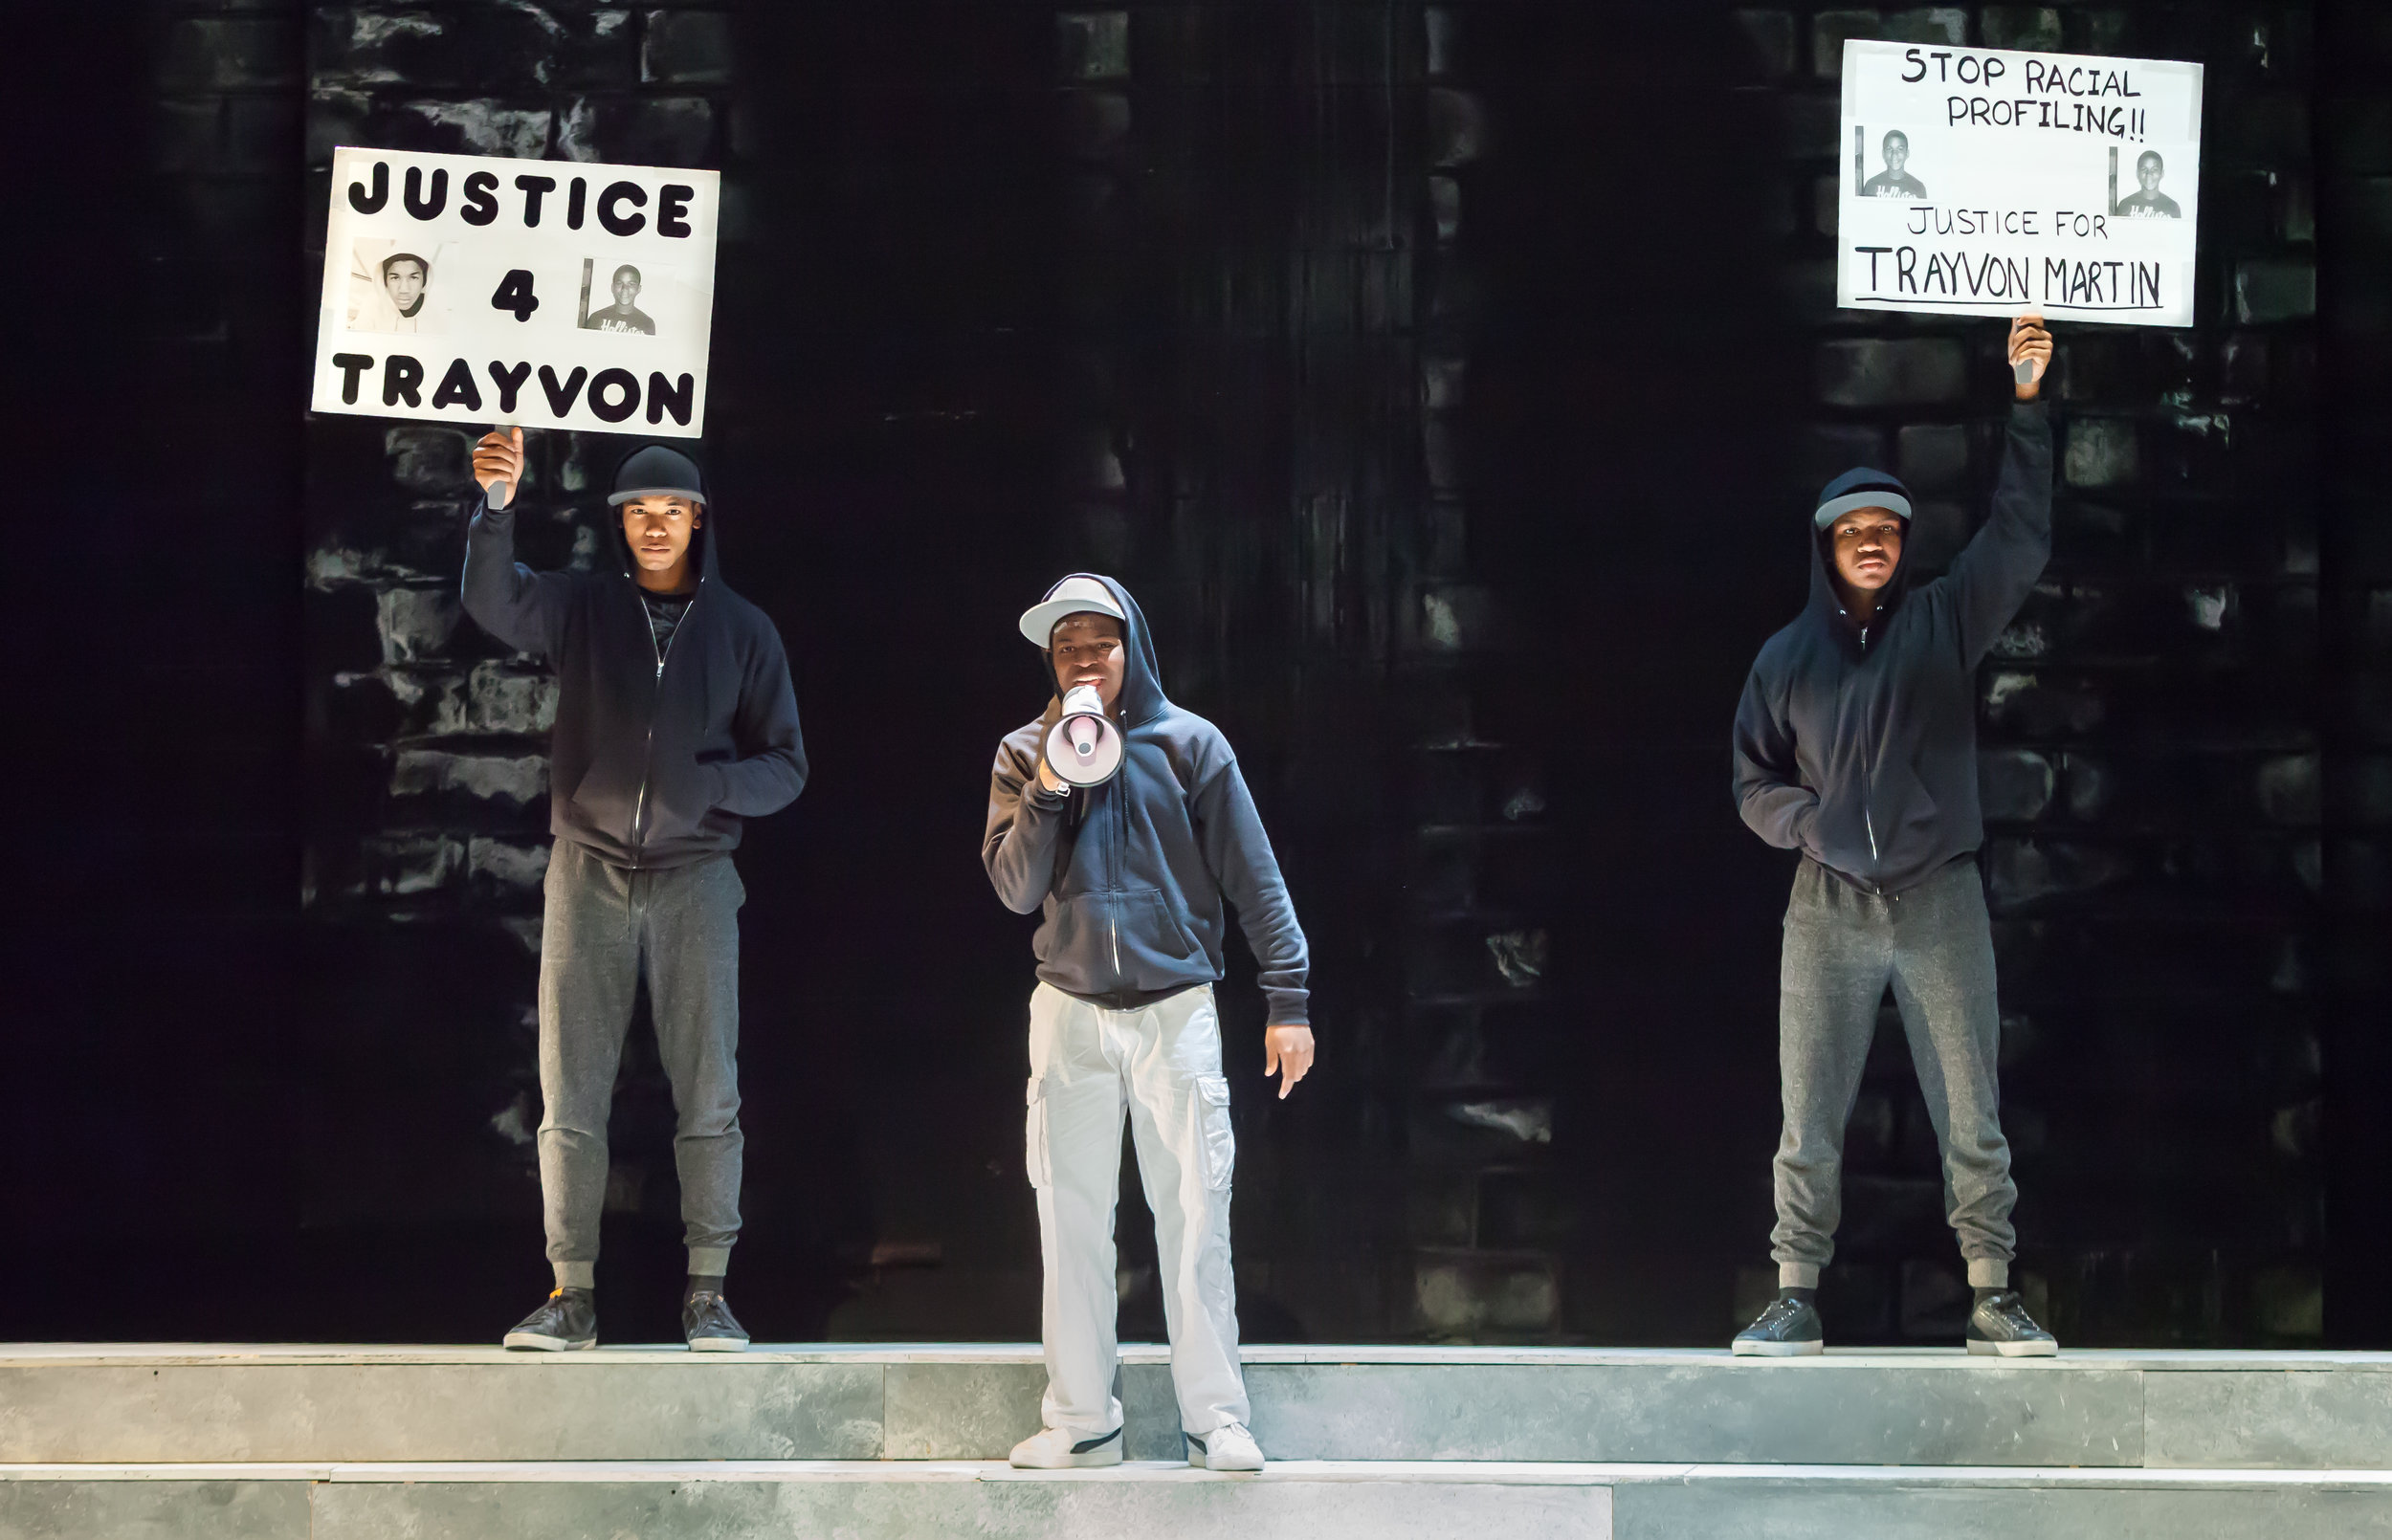 Trayvon1.jpg